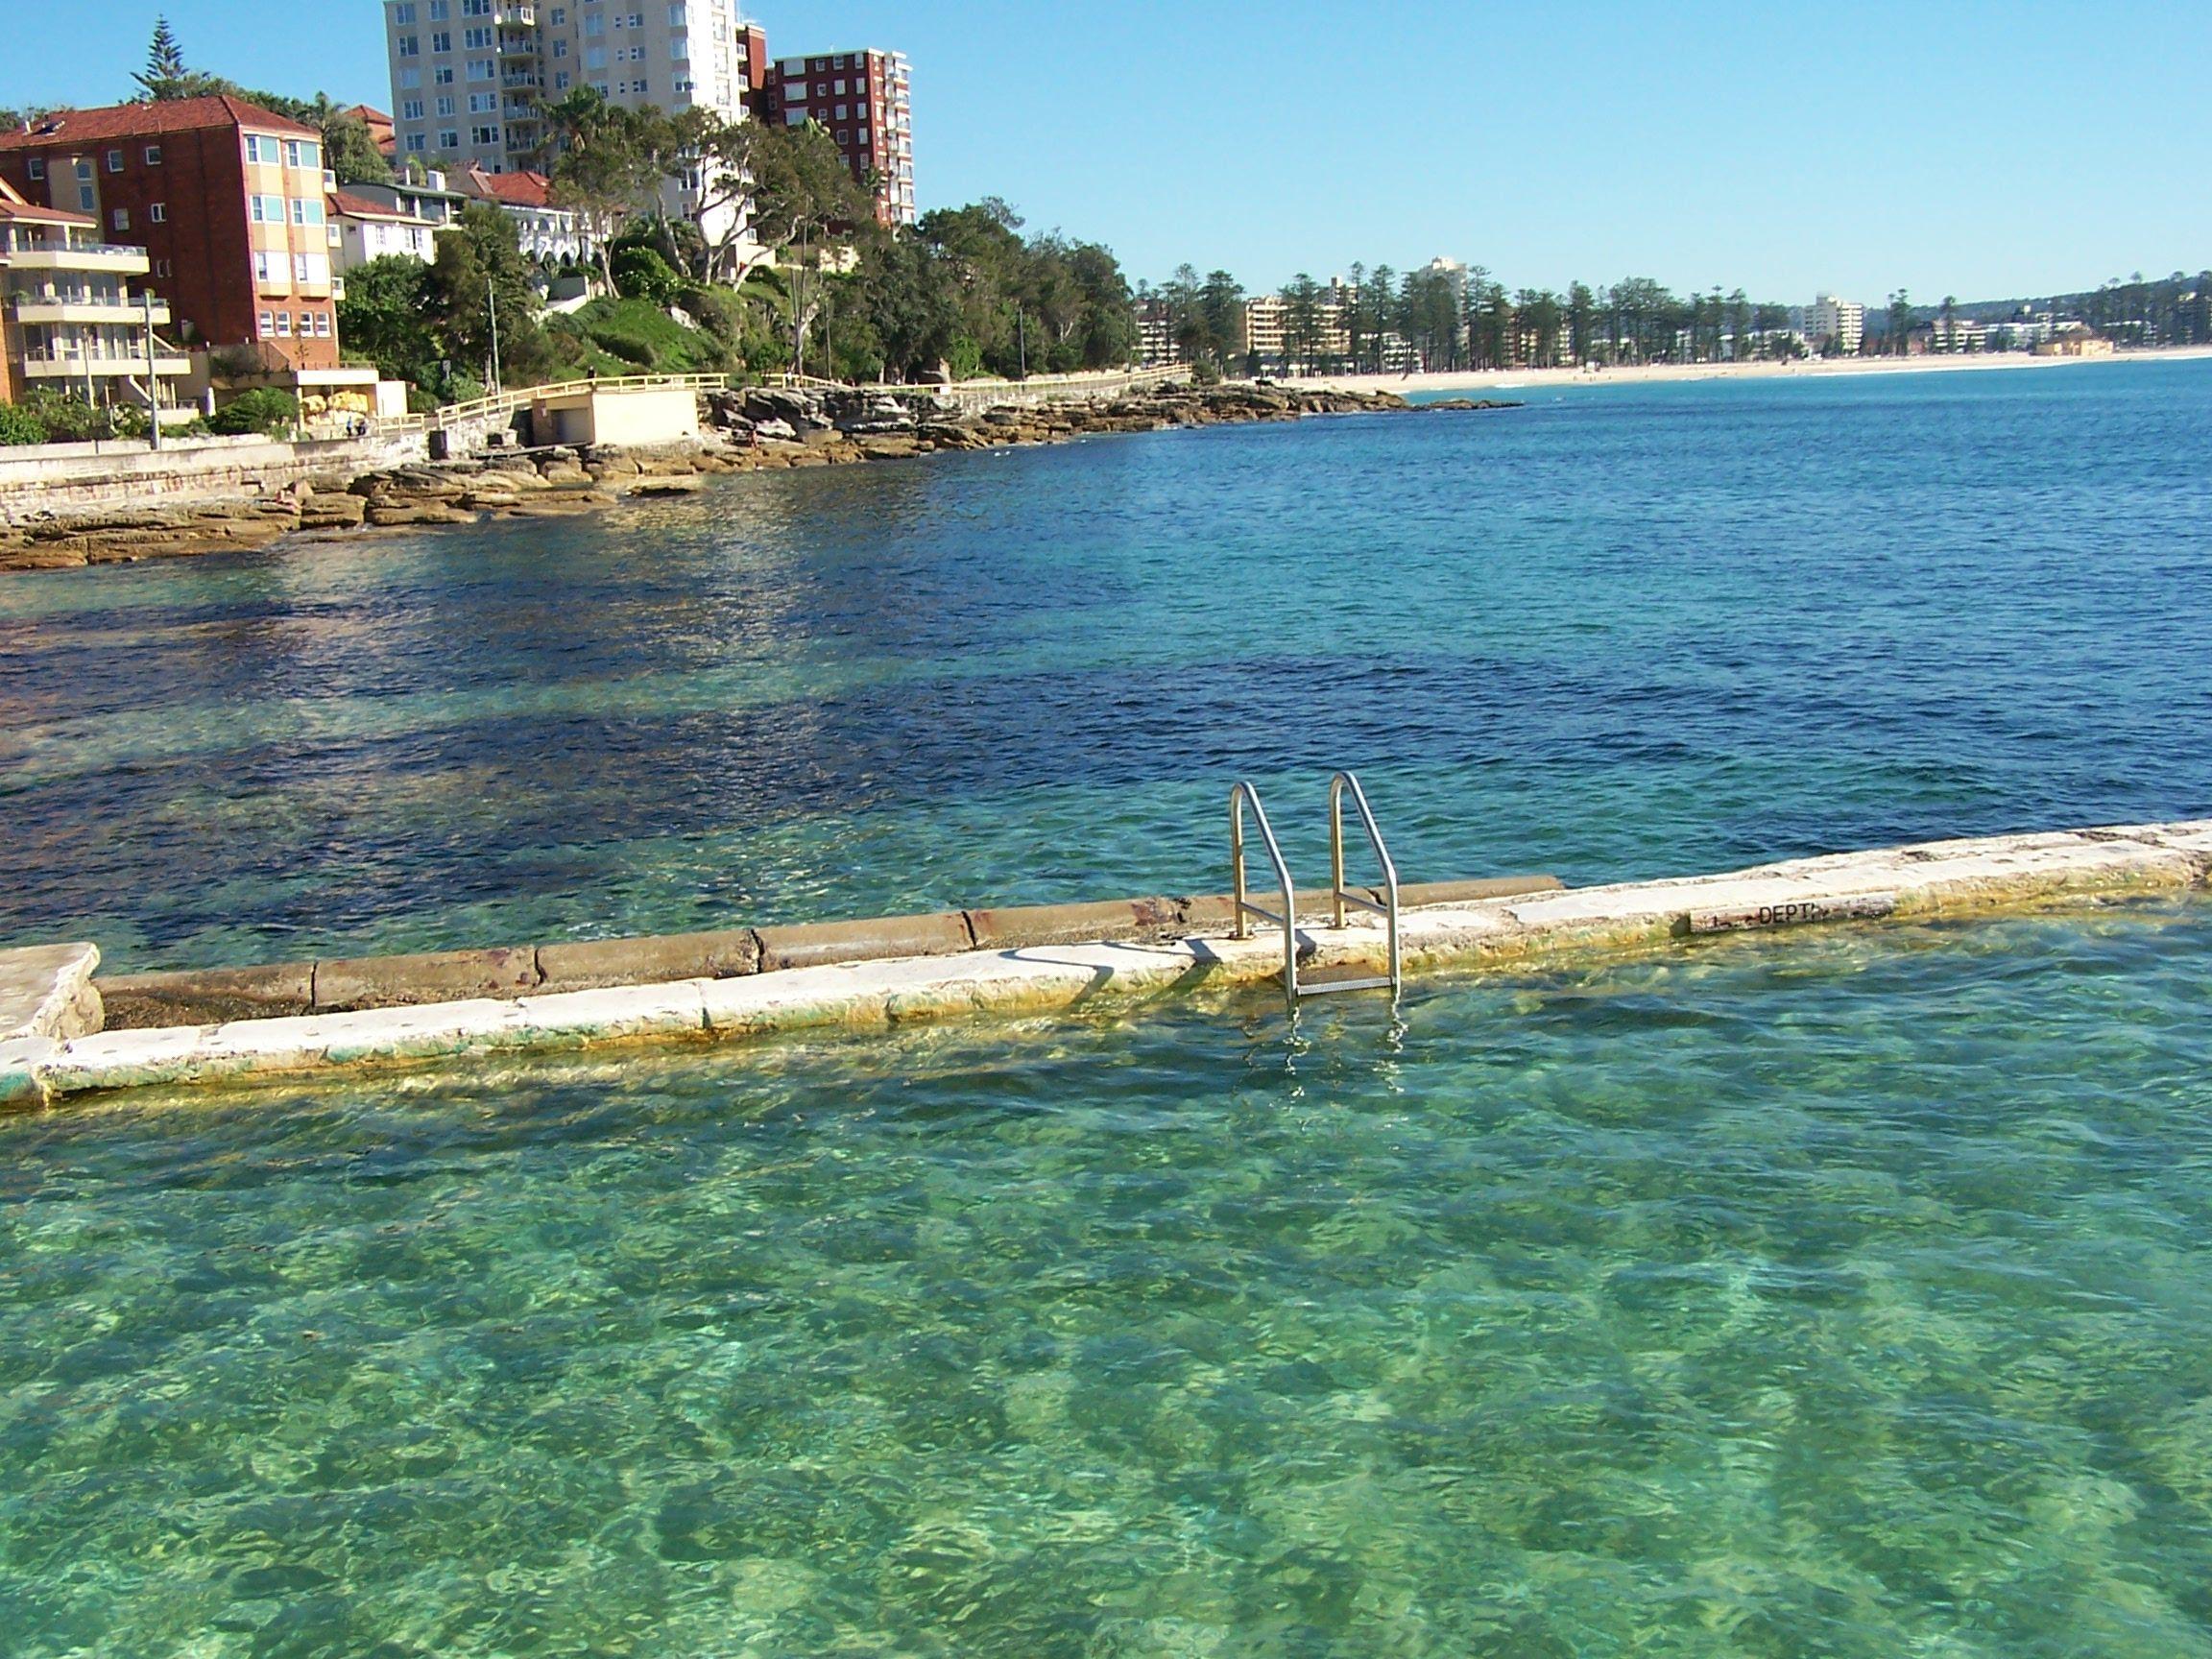 Manly Beach Australia Natural Pool Australia Pinterest Manly Beach Australia Manly Beach